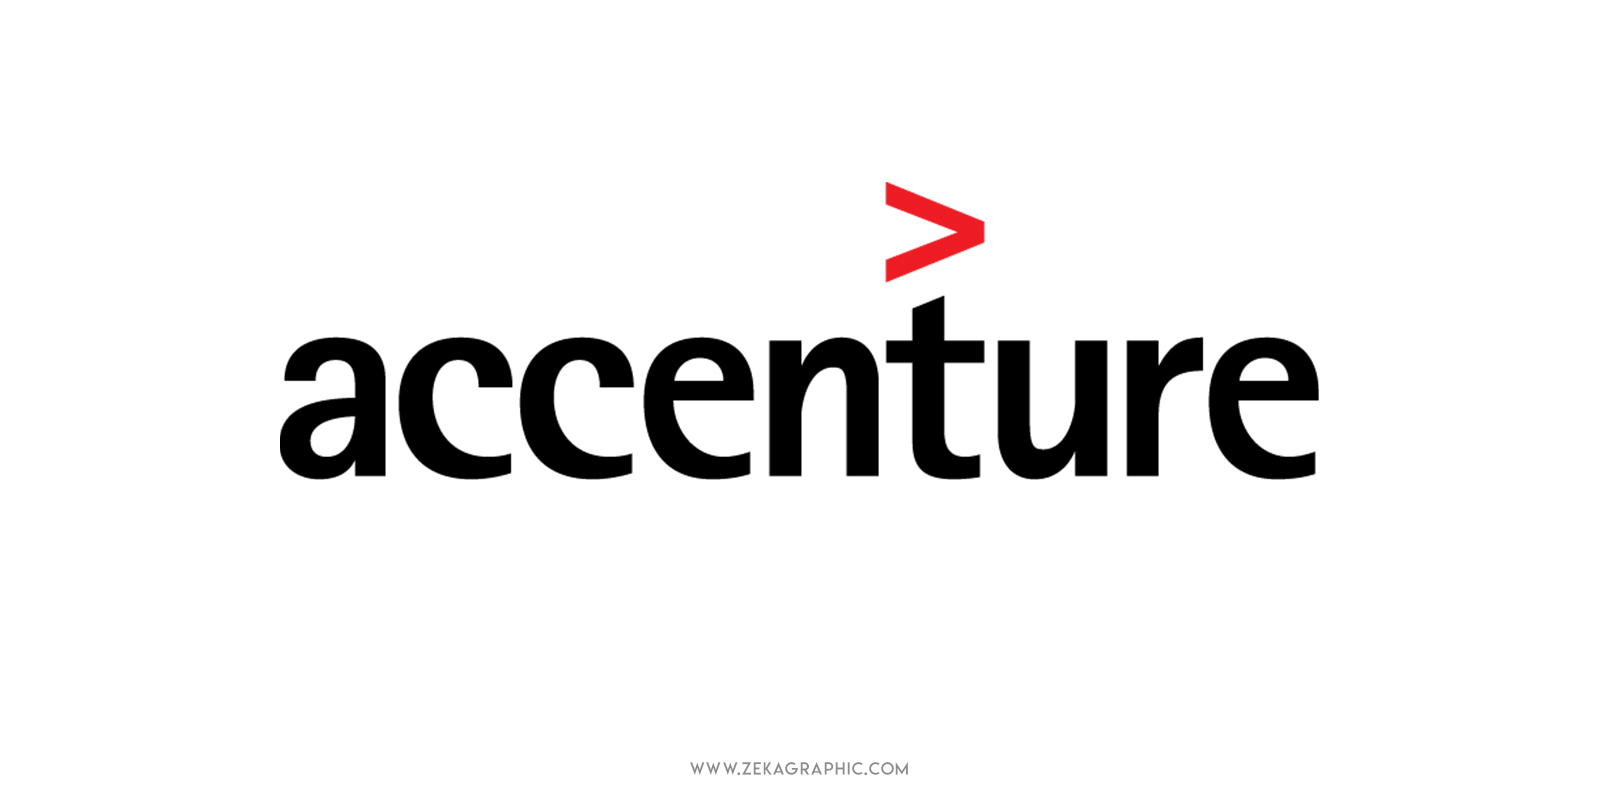 Accenture Logo Design Most Expensive logos ever